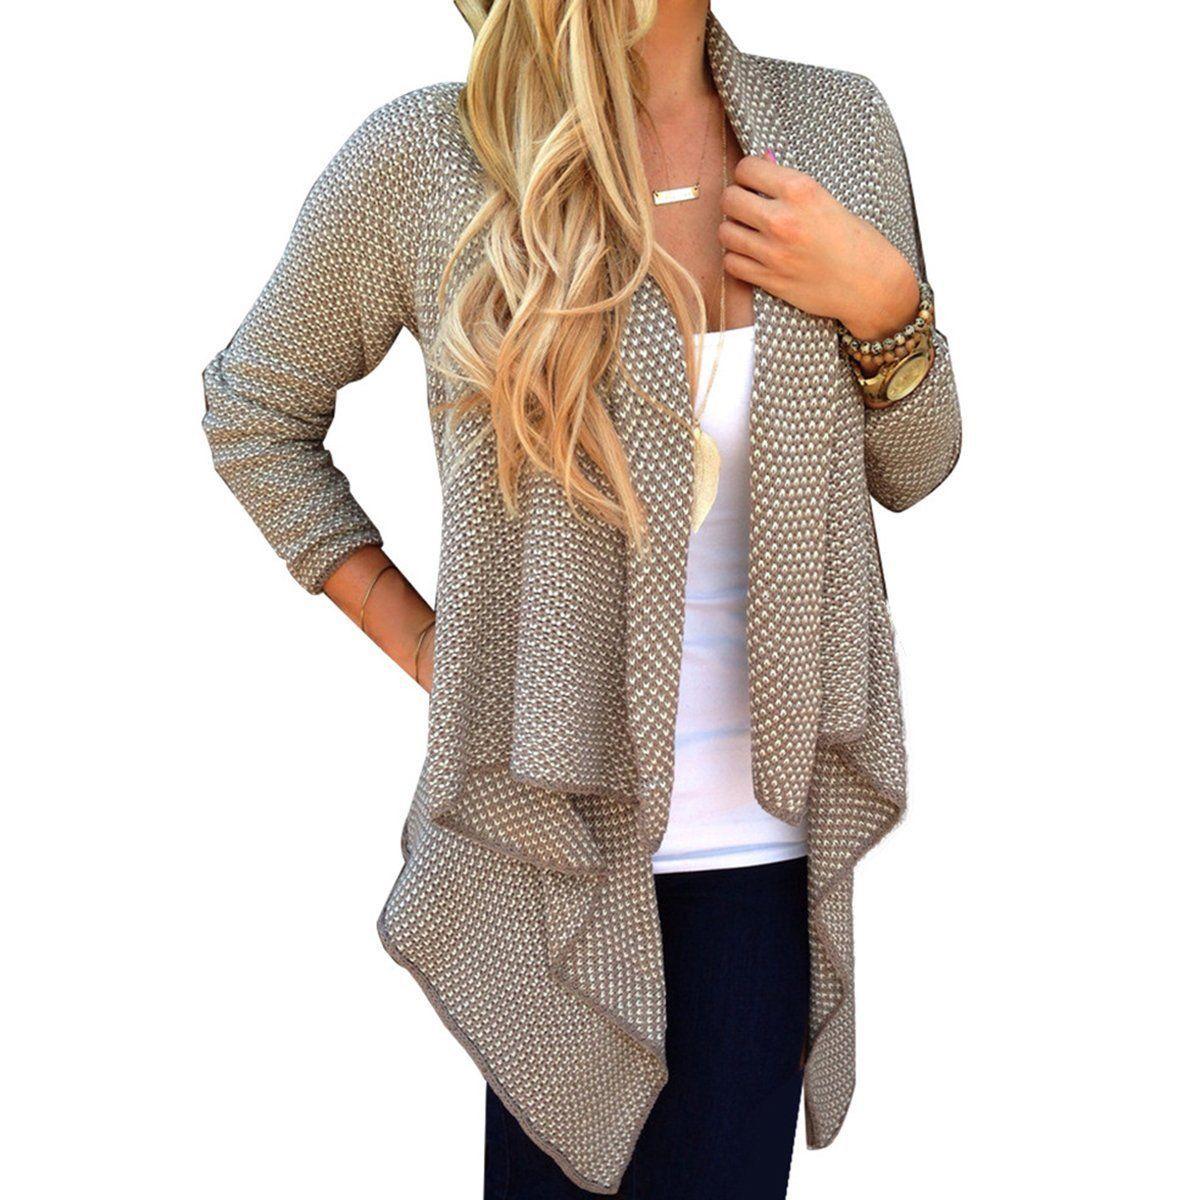 2017 Frühling Herbst Frauen Strickjacke Langarm Unregelmäßige Lose Beiläufige Strickwaren Pullover Mantel Tops Outwear Poncho Kimono Mantel Cape